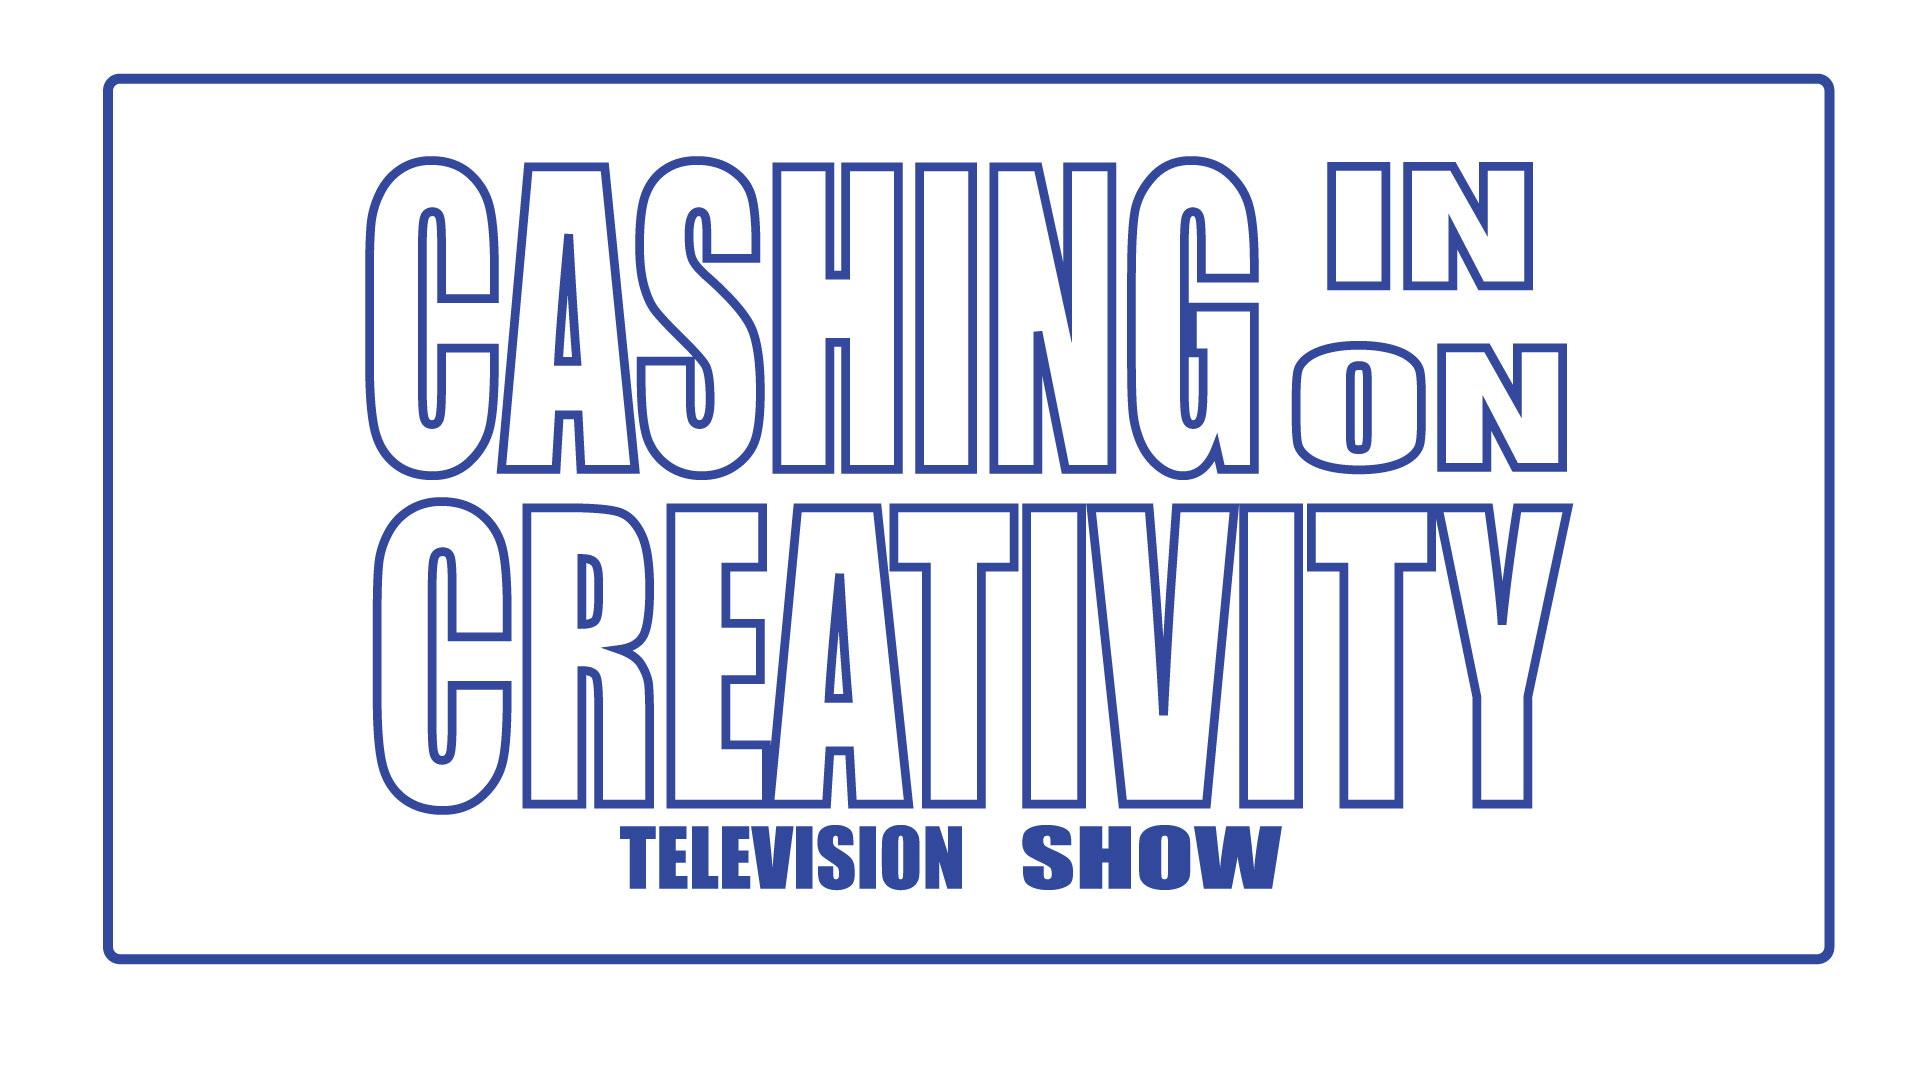 Cashing-in-on-Creativity-TV-Show